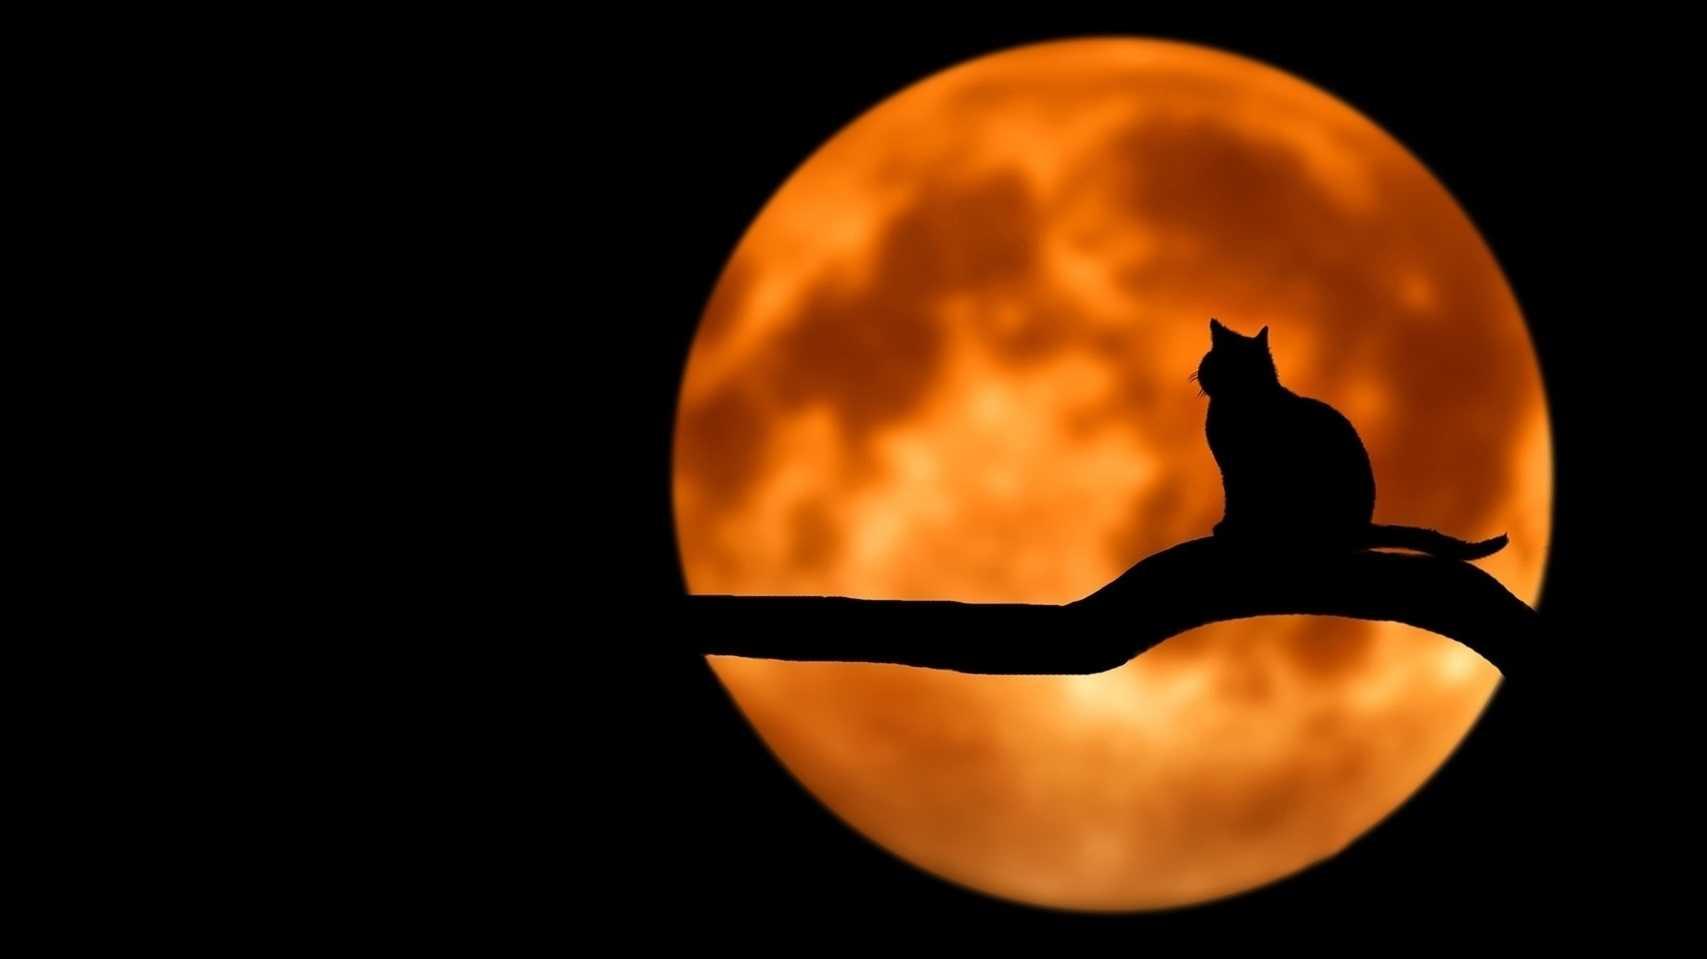 Sommer, Nacht, Sonne, Katzen